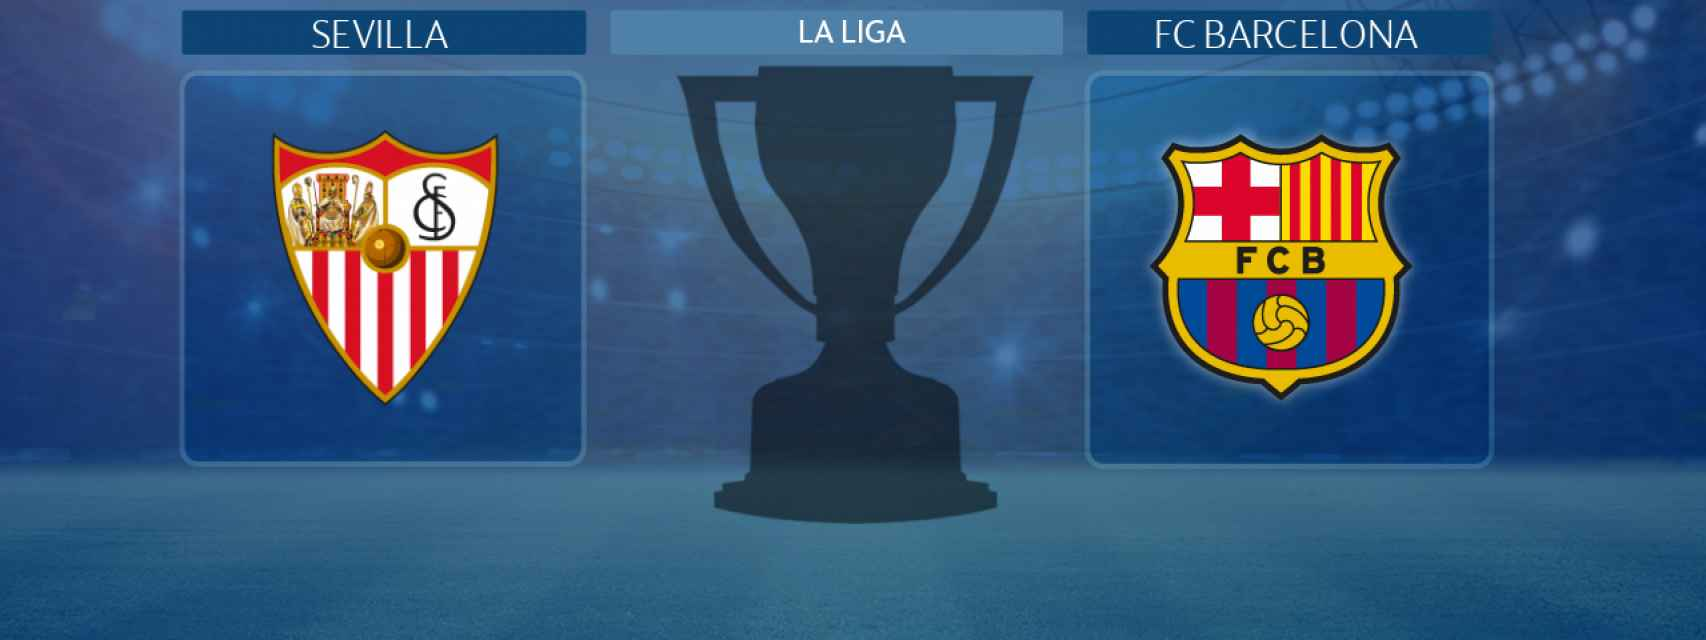 Sevilla - FC Barcelona, partido de La Liga